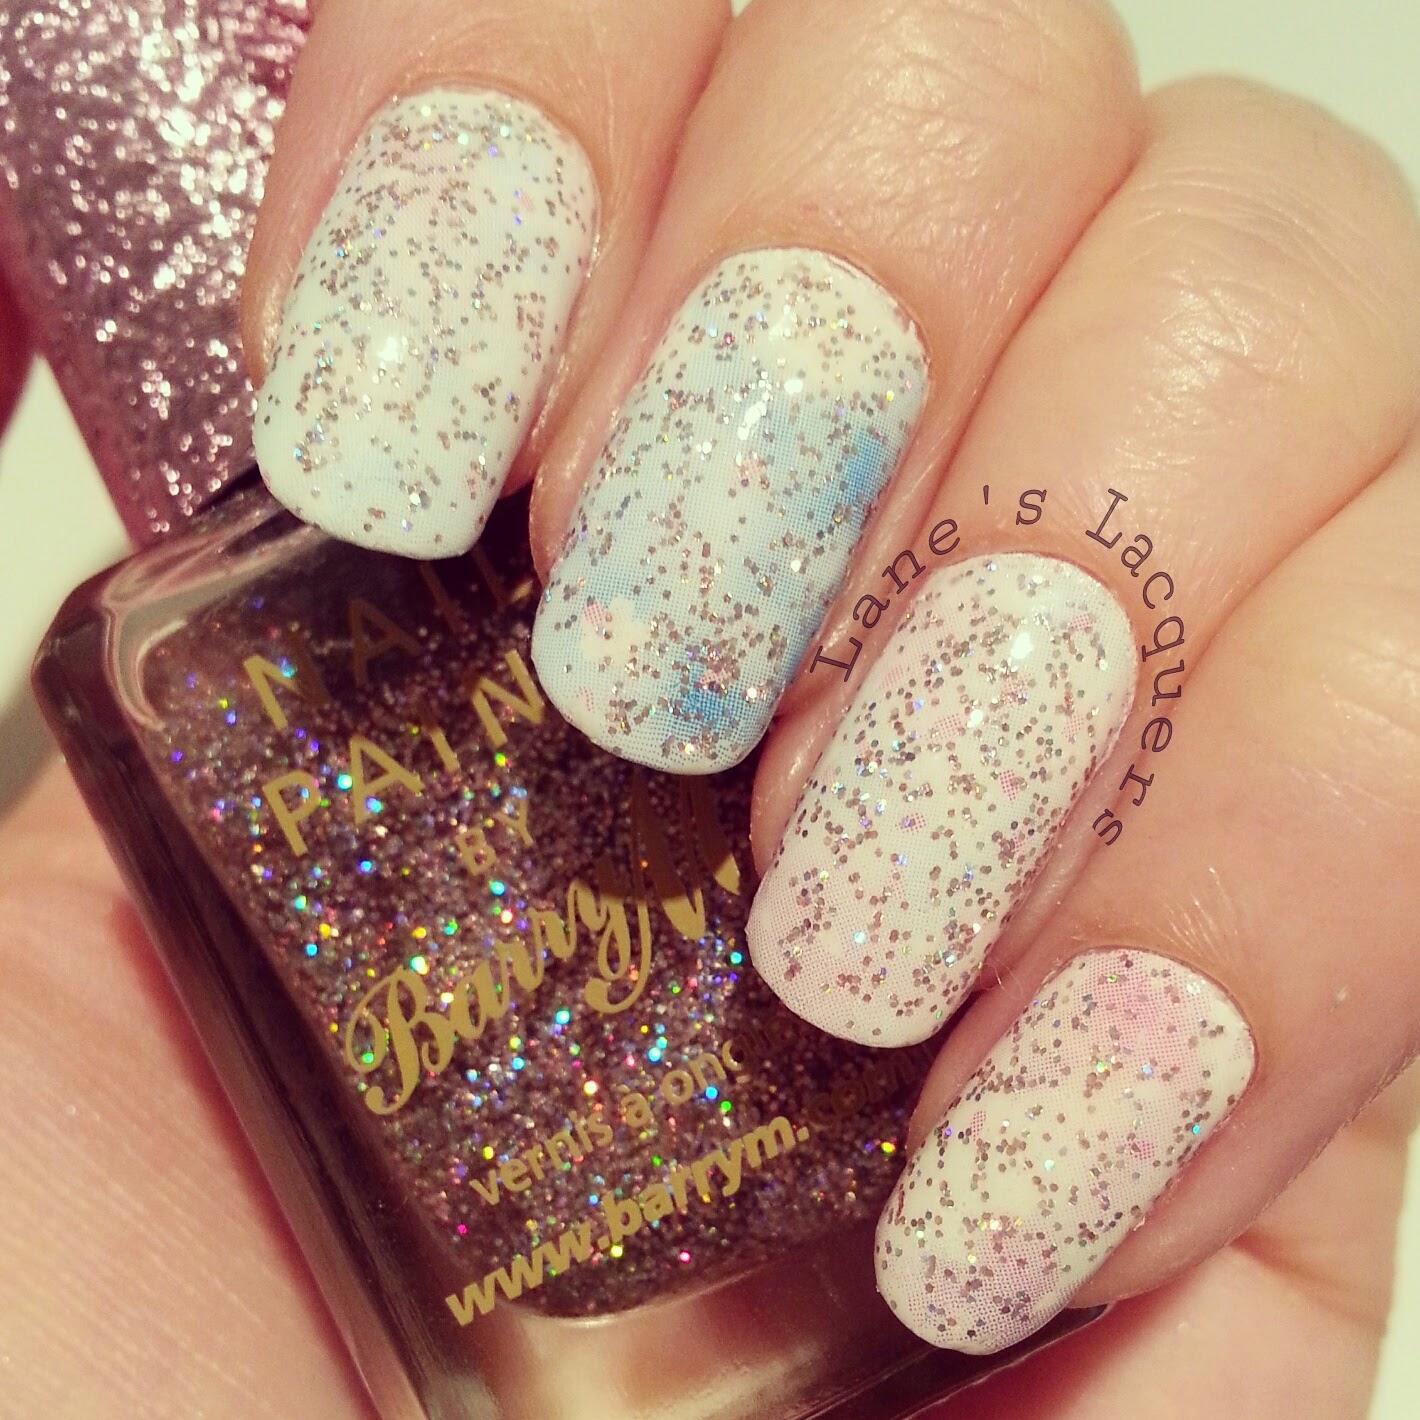 ethereal-nail-art-born-pretty-store-nail-transfers (2)